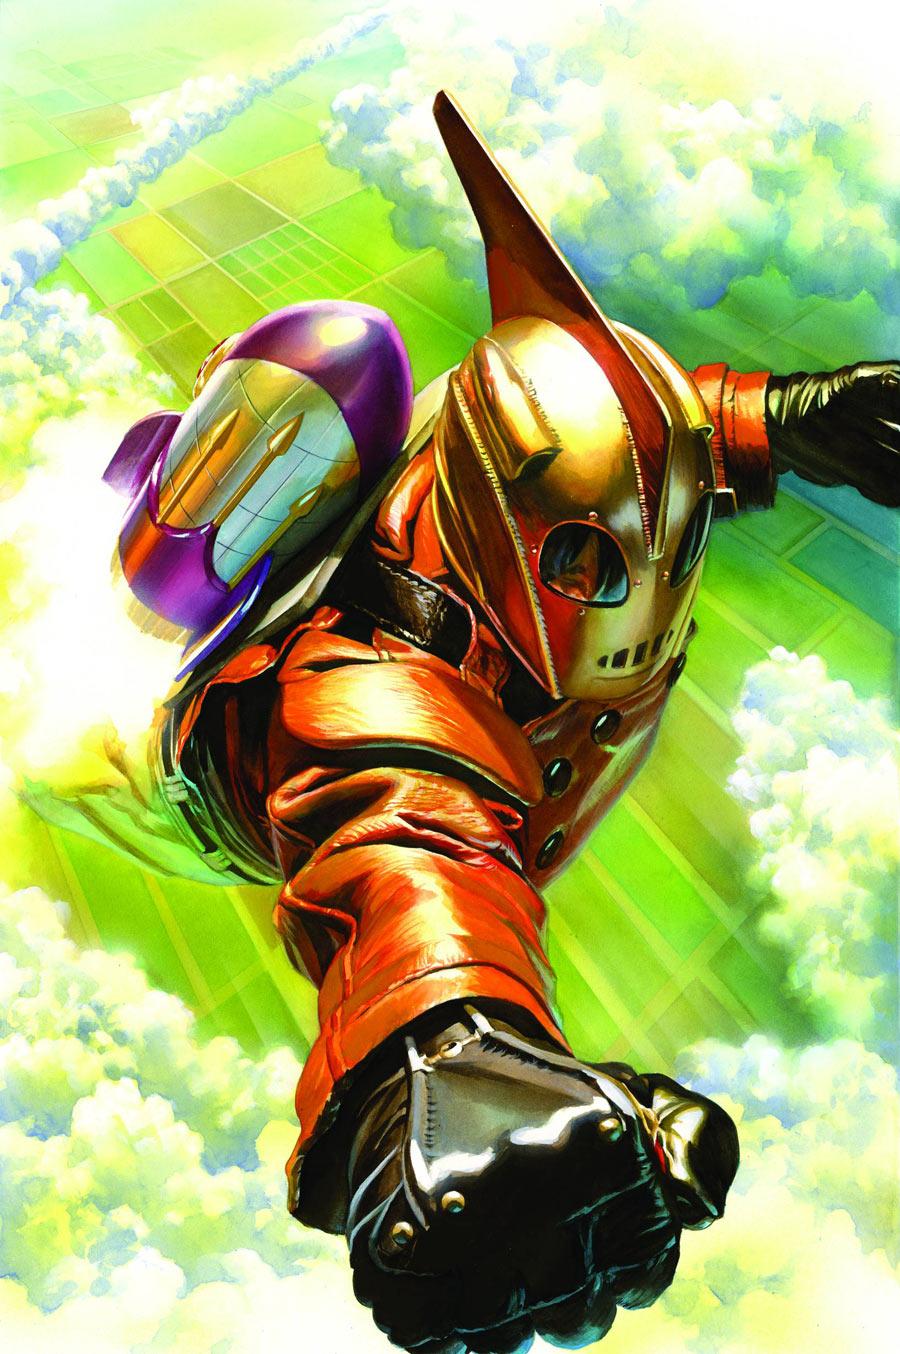 Ракетчик, The Rocketeer, экранизация комикса, фантастика, рецензия, обзор, Comic Book Adaptation, SciFi, Review